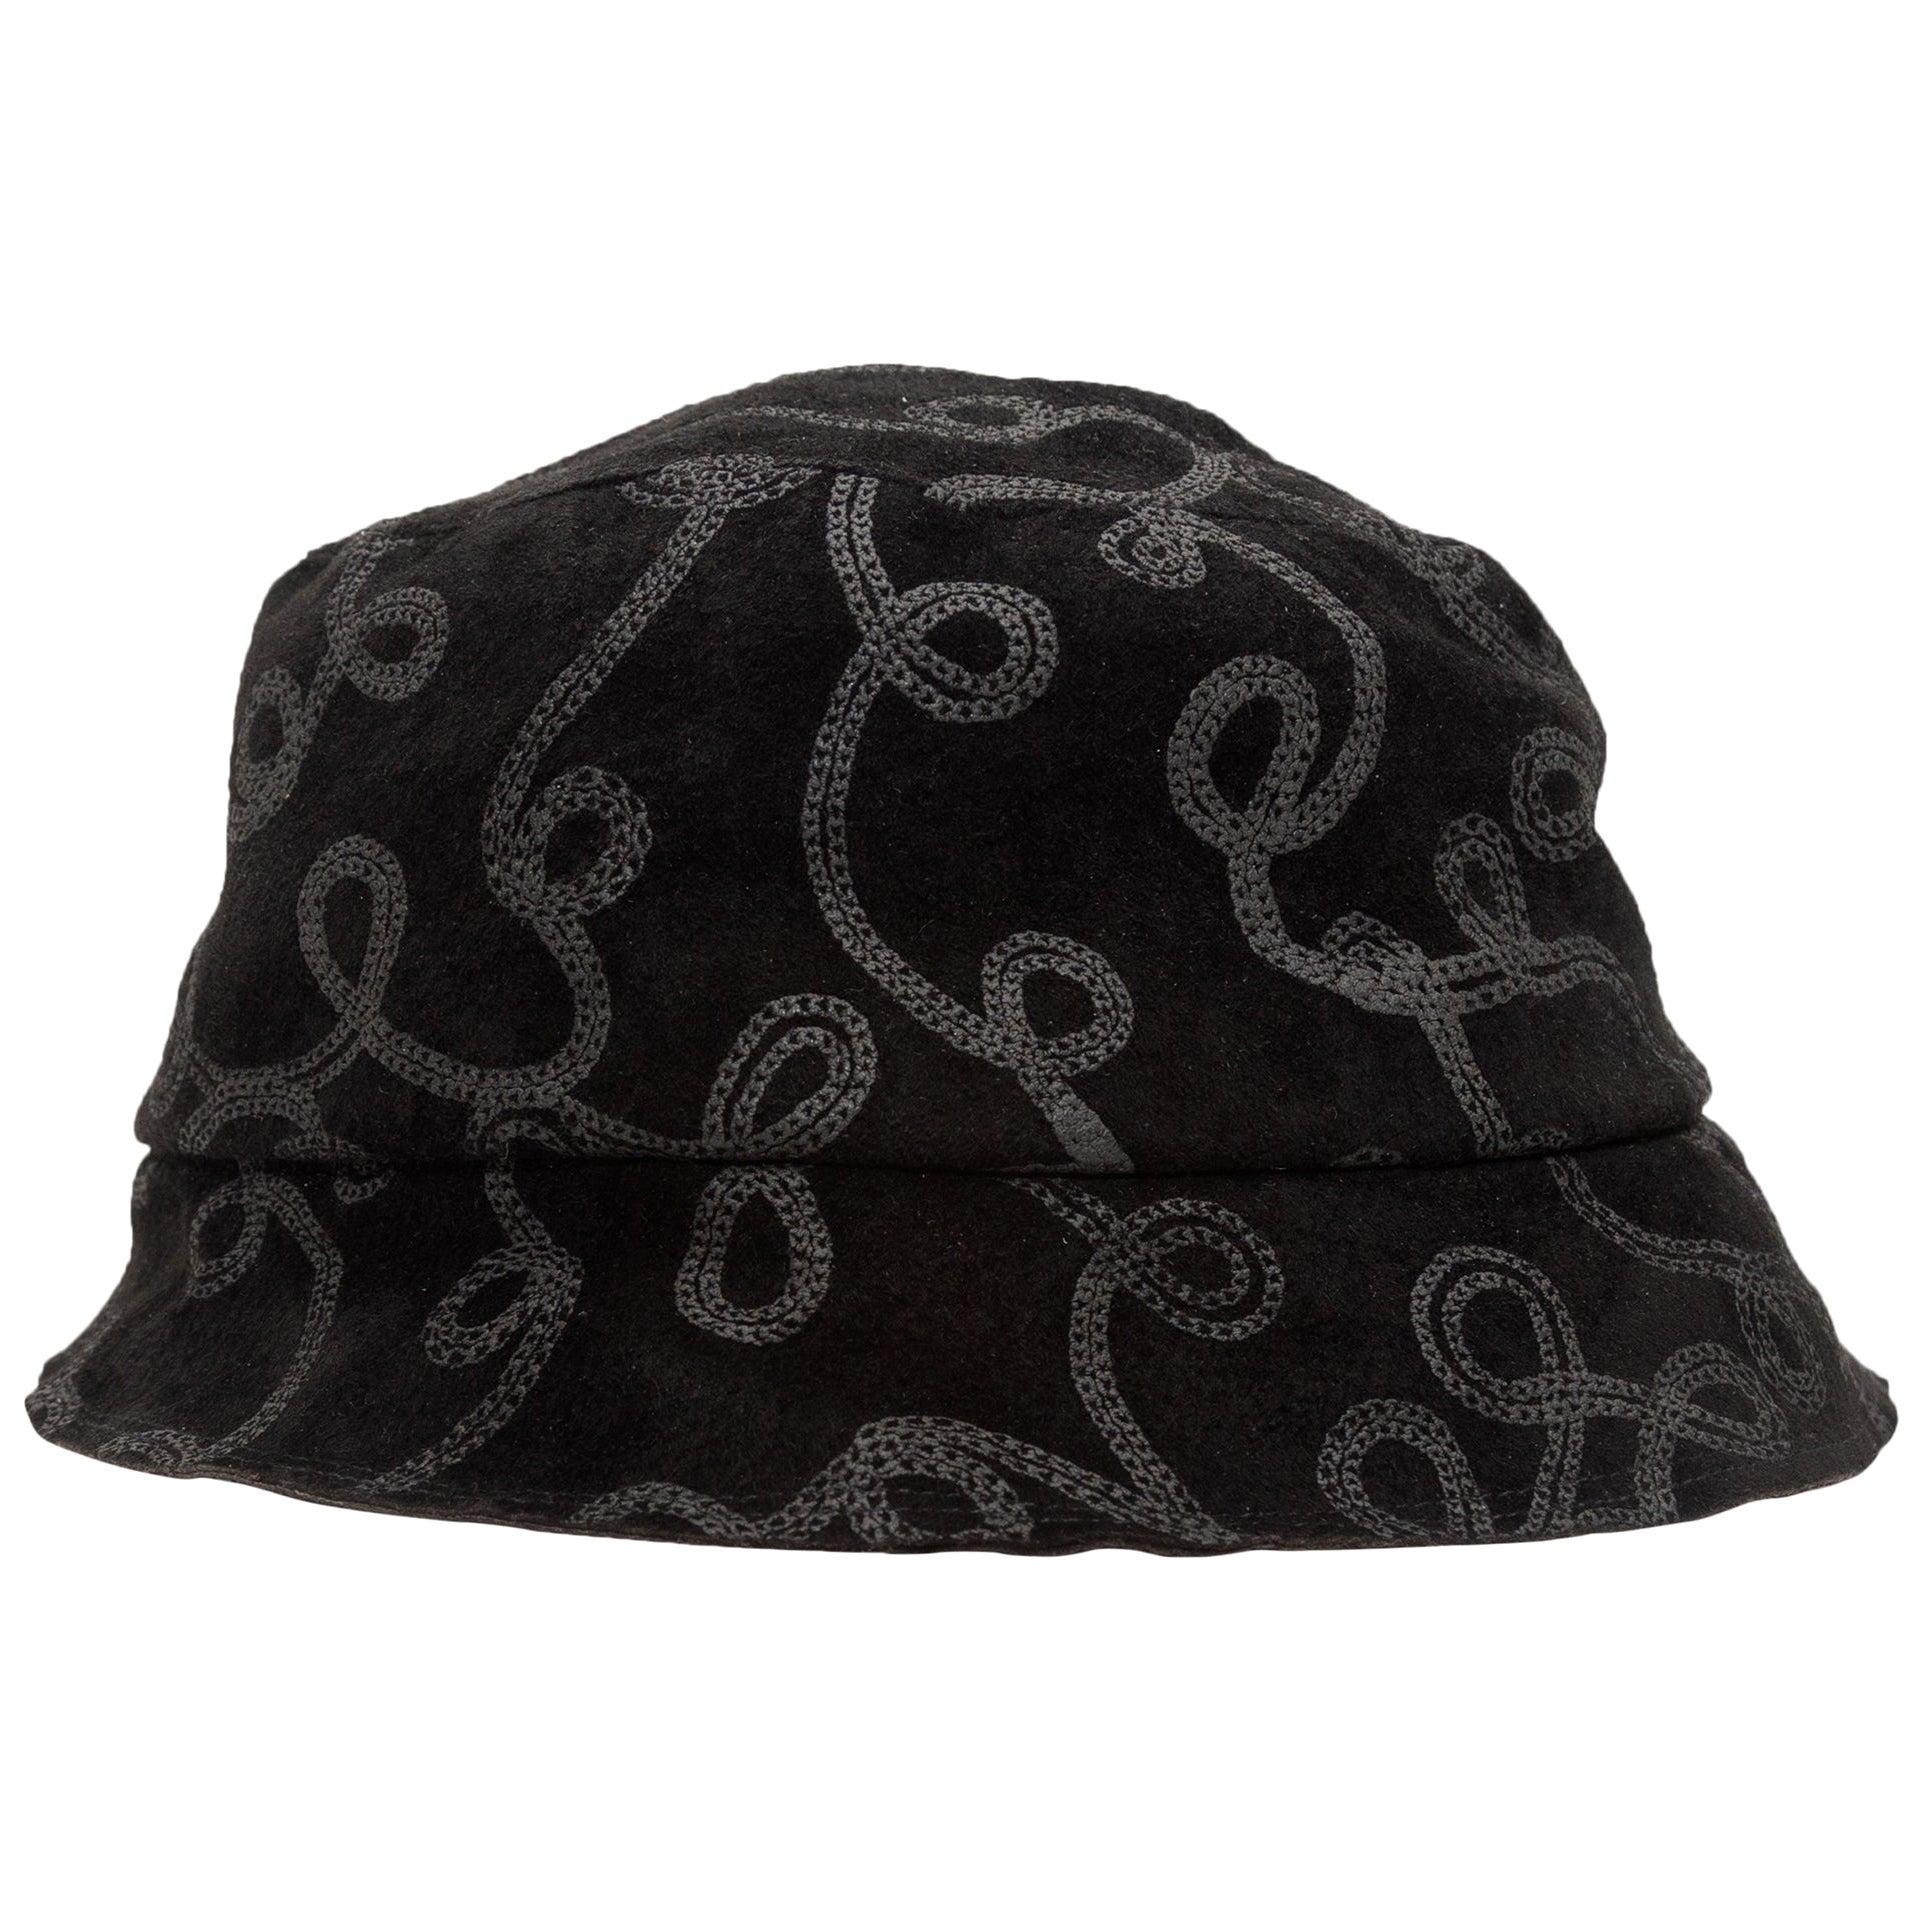 Patricia Underwood Black Patterned Bucket Hat